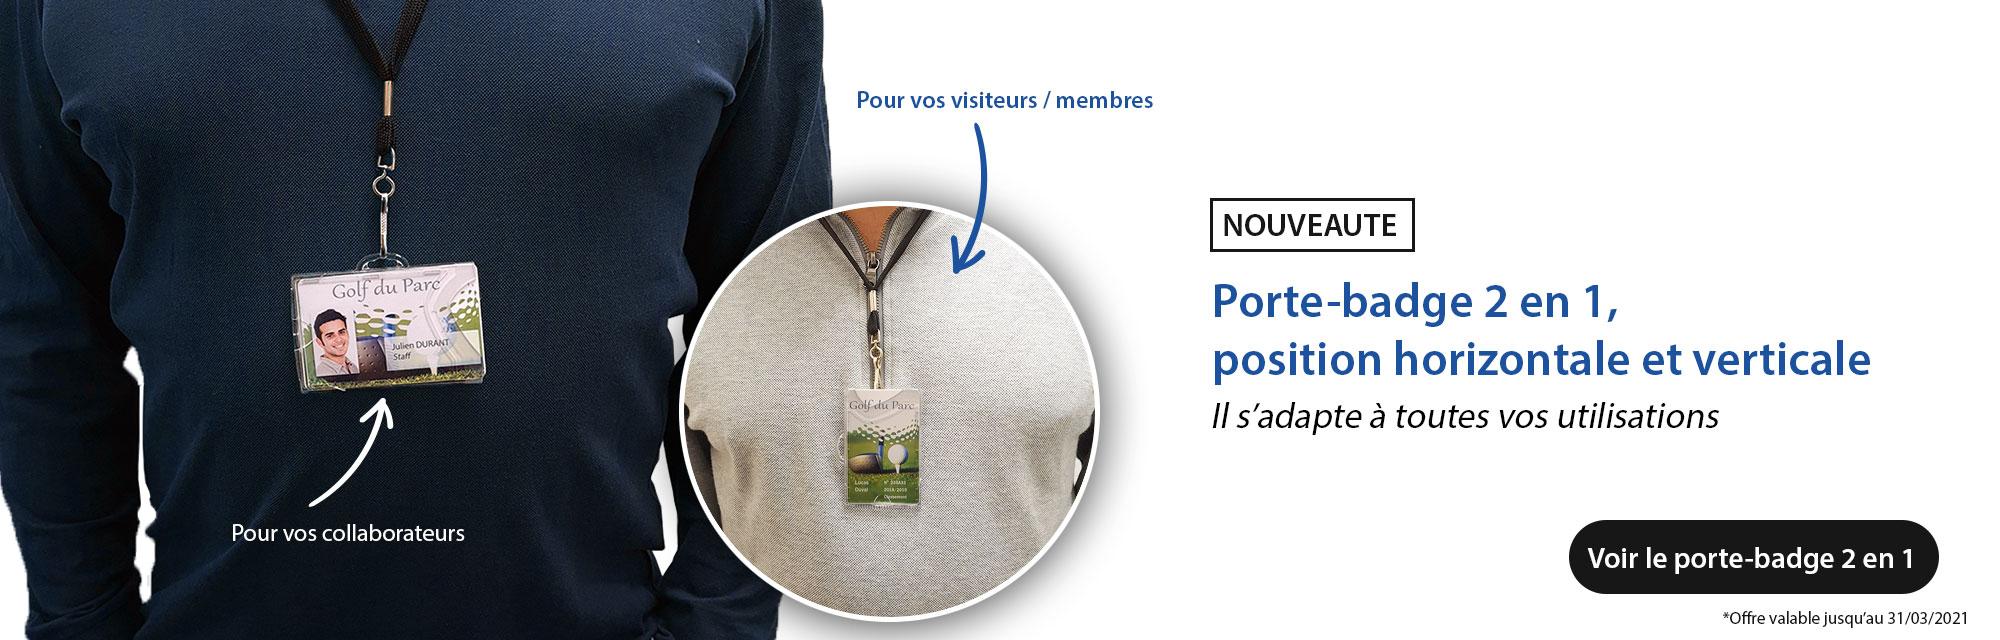 Porte-badge rigide 2 en 1 - horizontal et vertical IDX